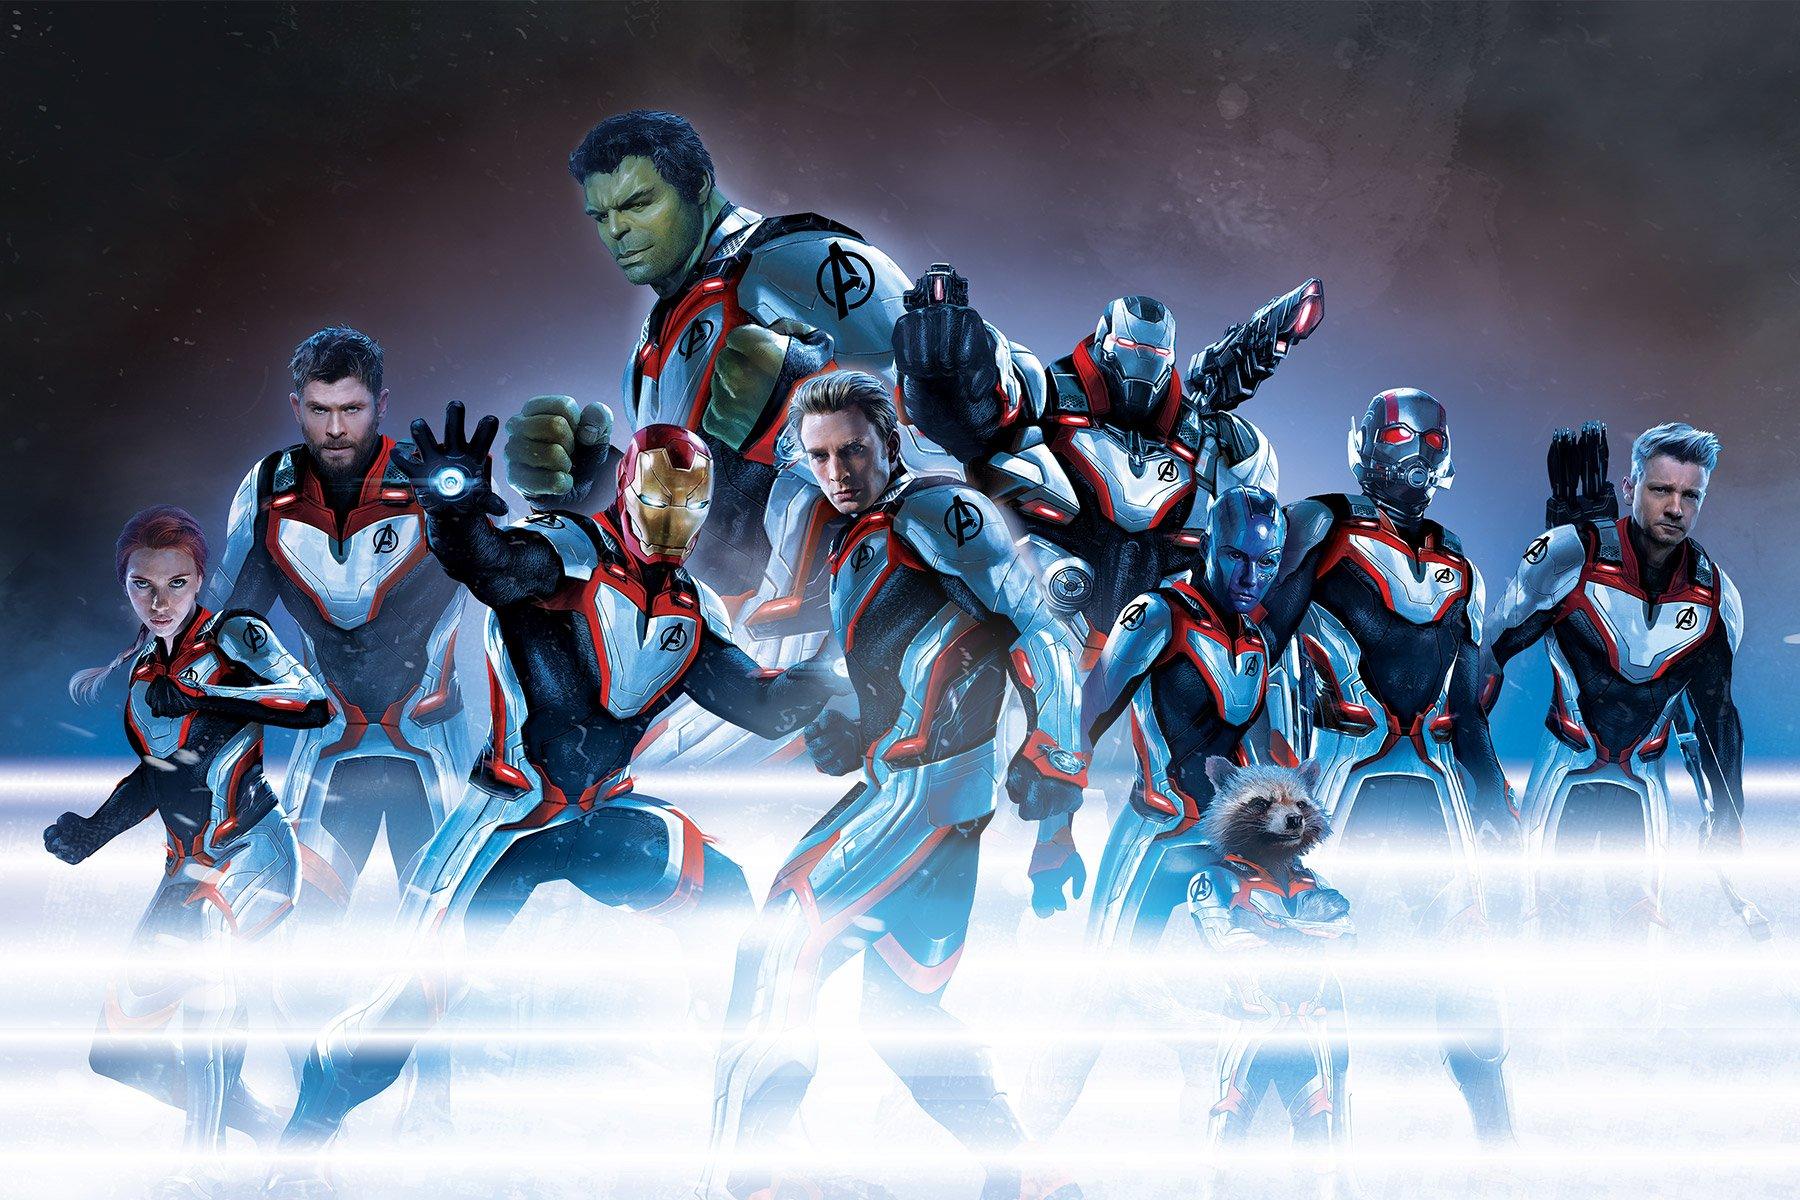 New Hi Res Avengers Endgame Promo Poster Assembles The New Team In